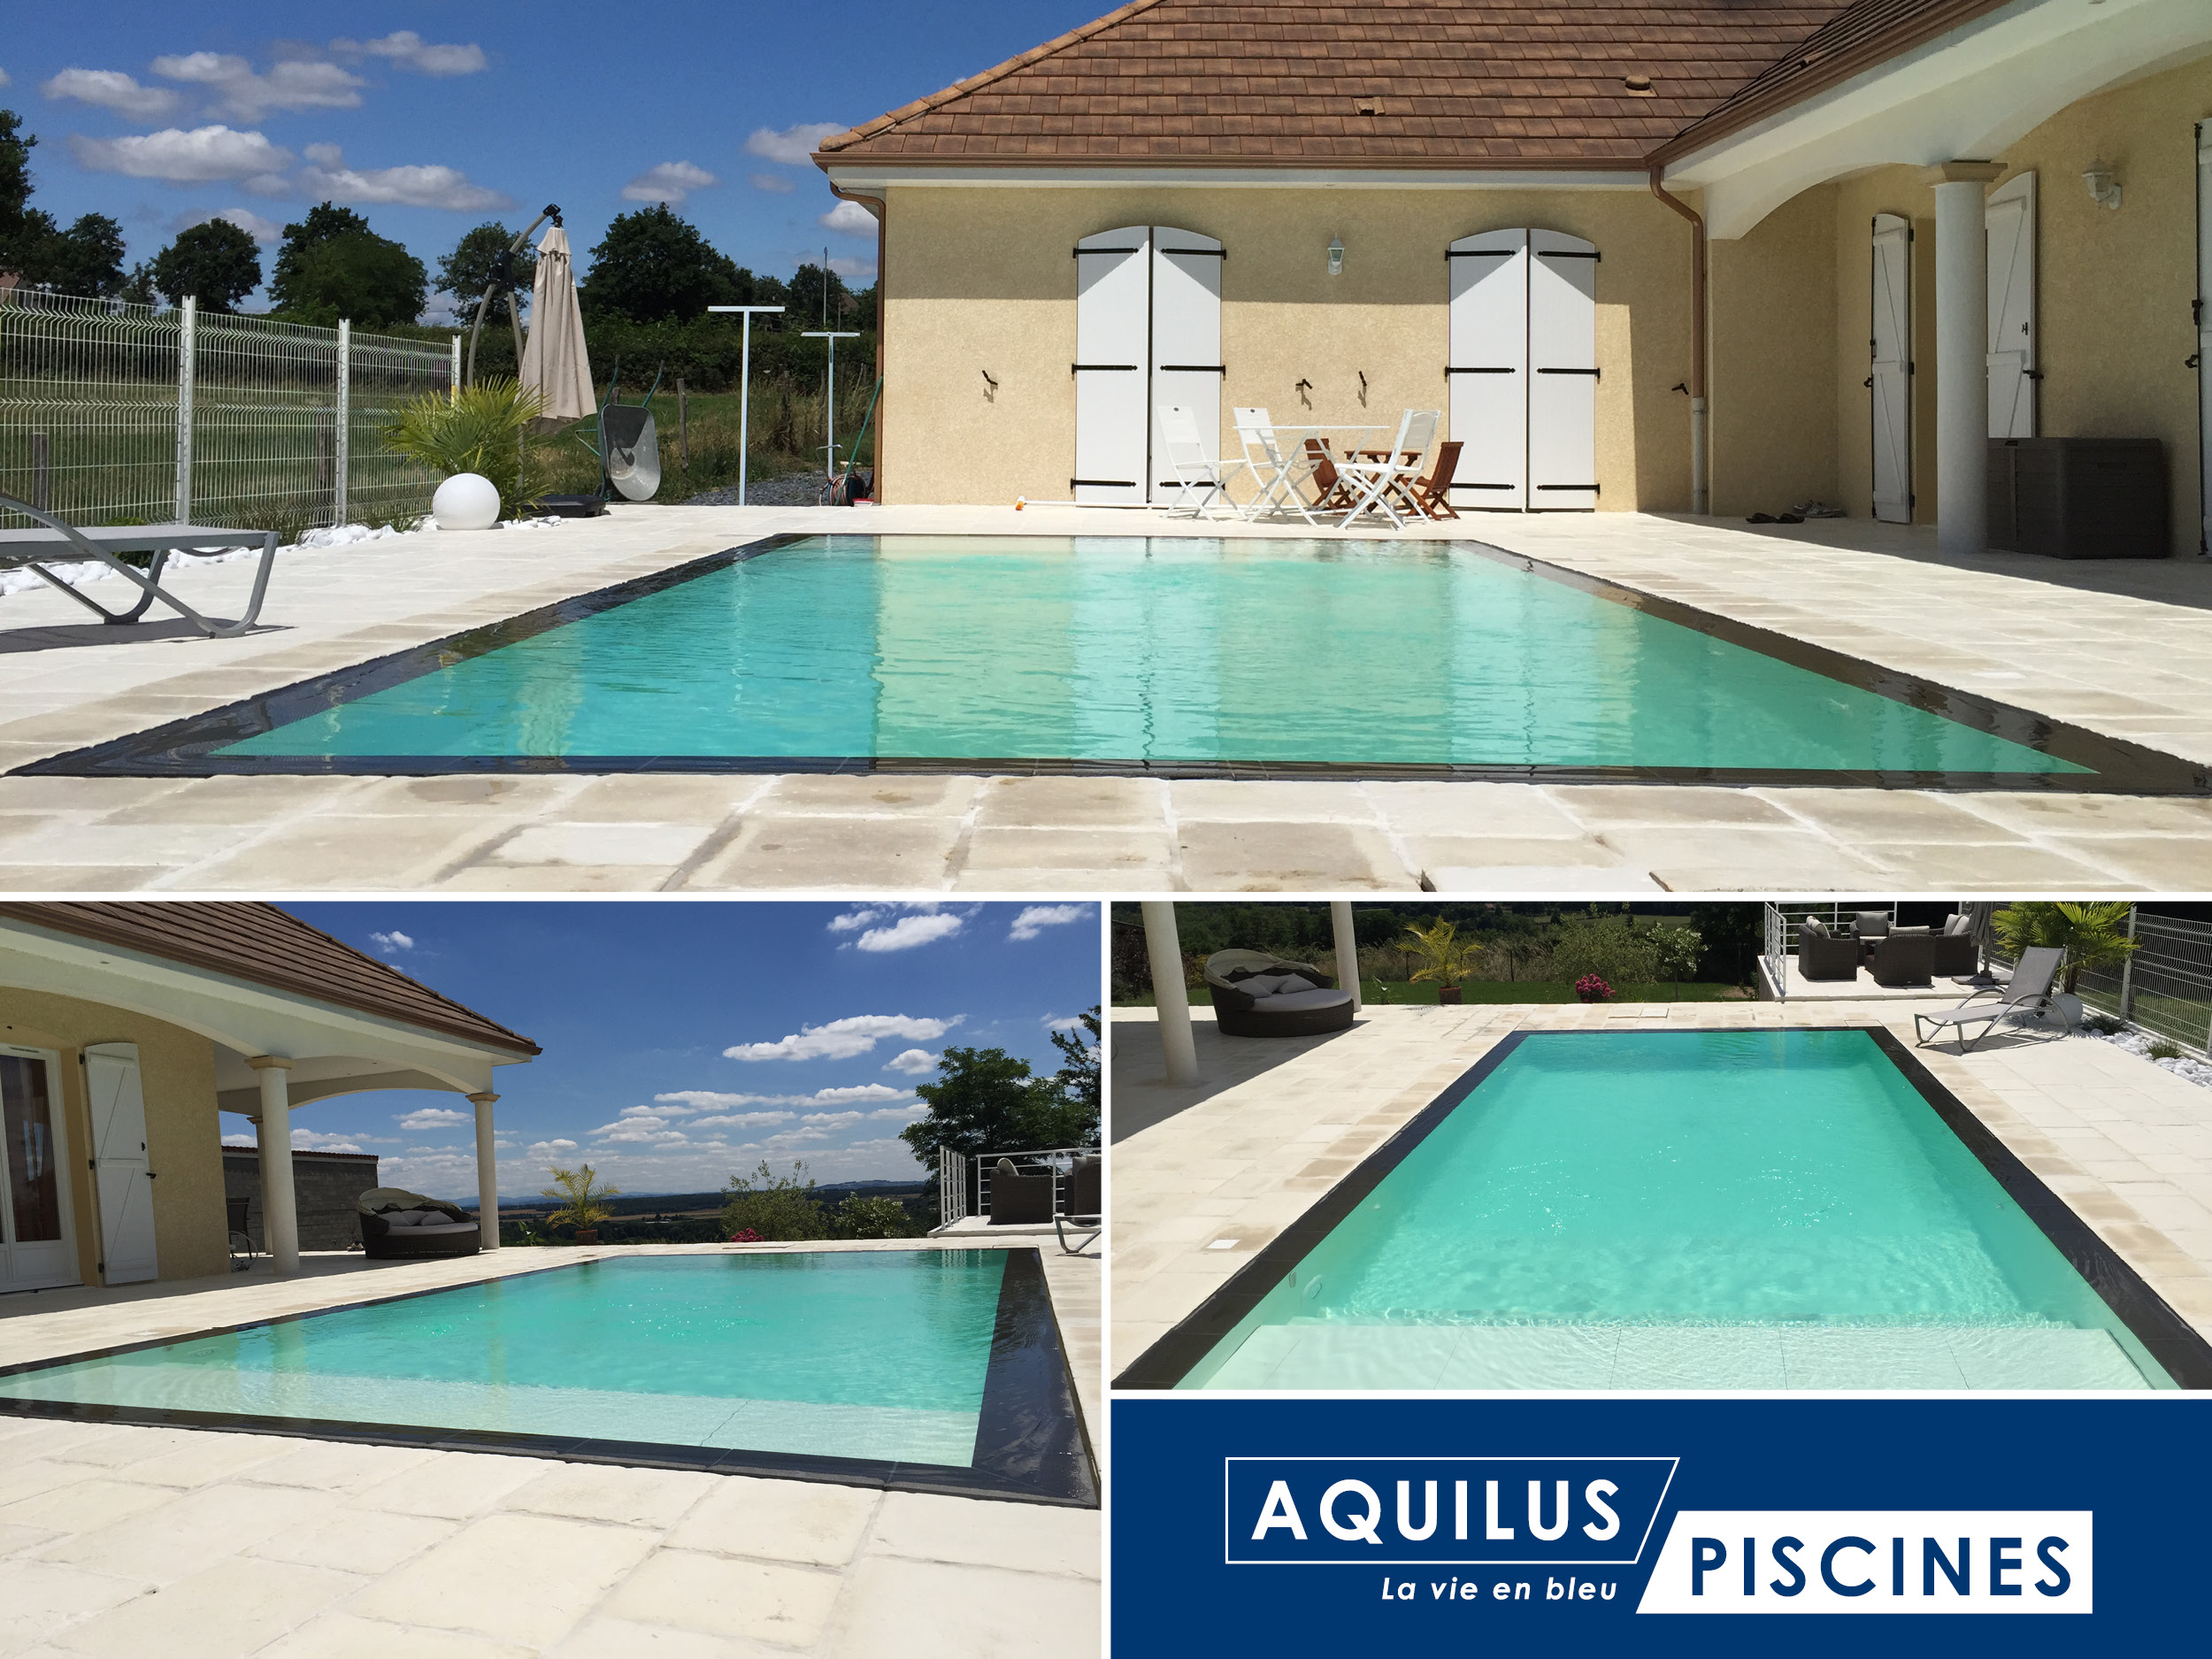 Votre quipe aquilus valence aquilus valence for Accessoire piscine aquilus